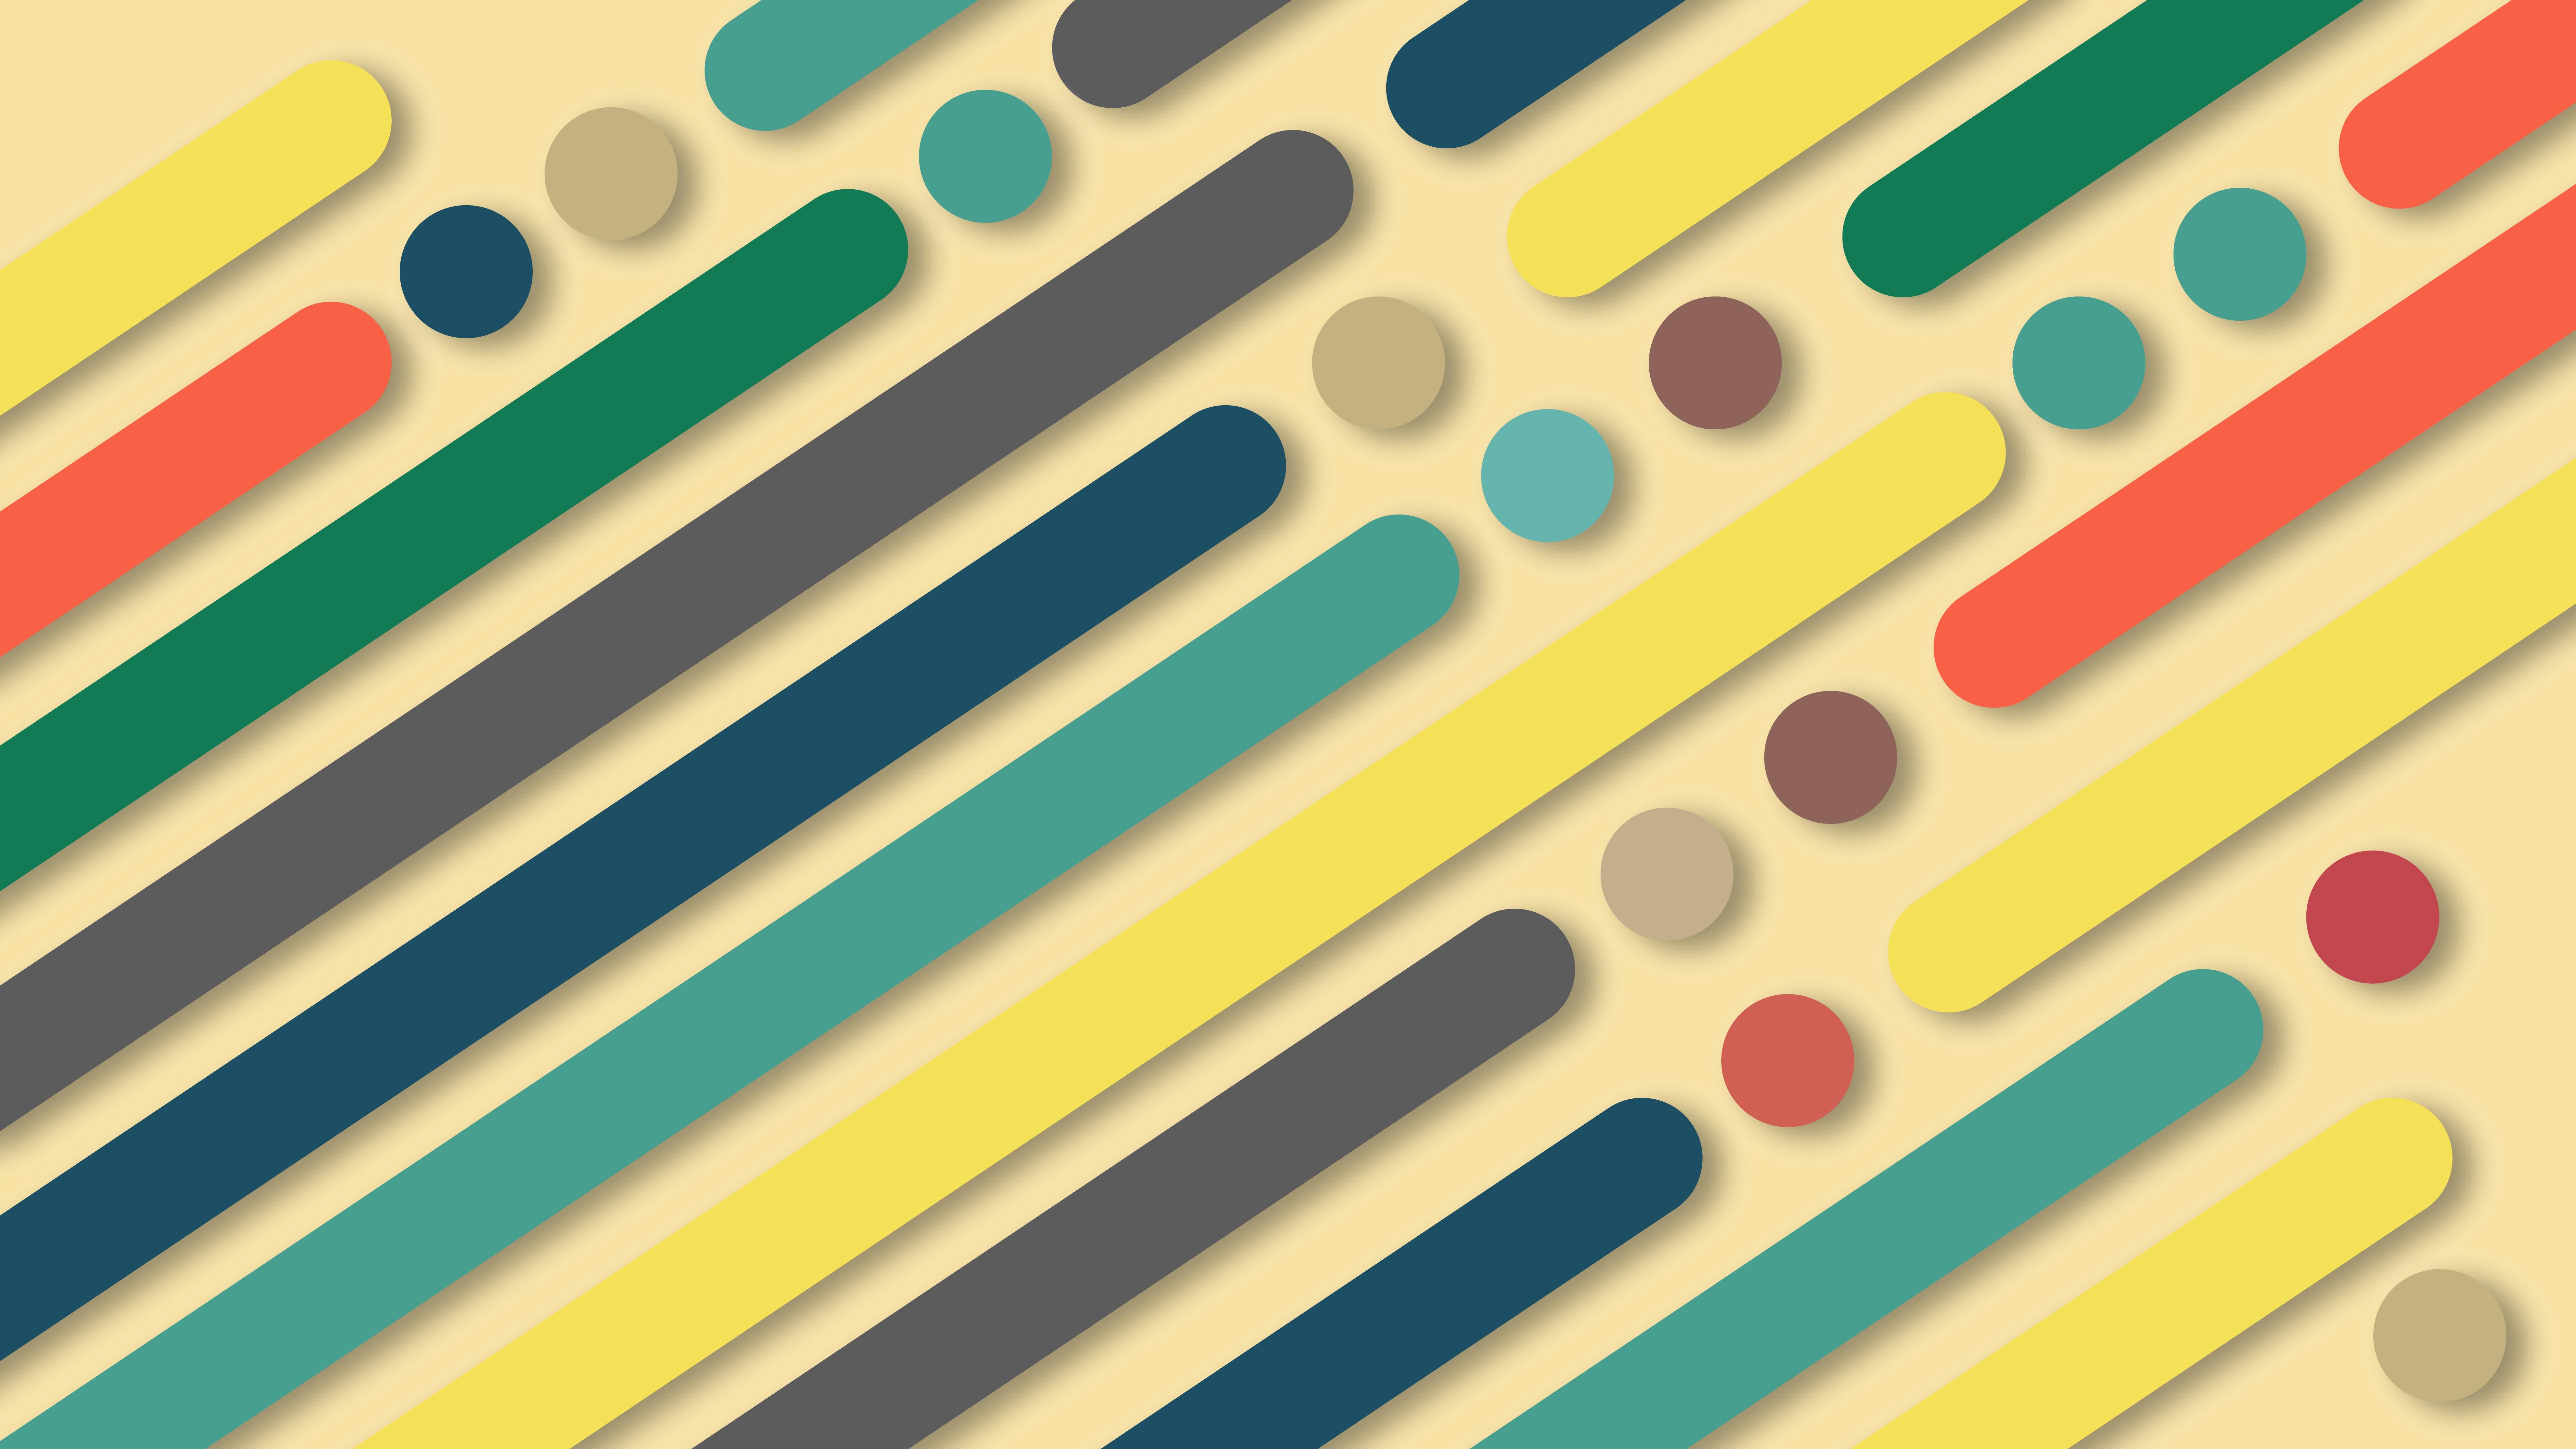 Coloured Shapes Wallpaper 8k Ultra Hd Wallpaper